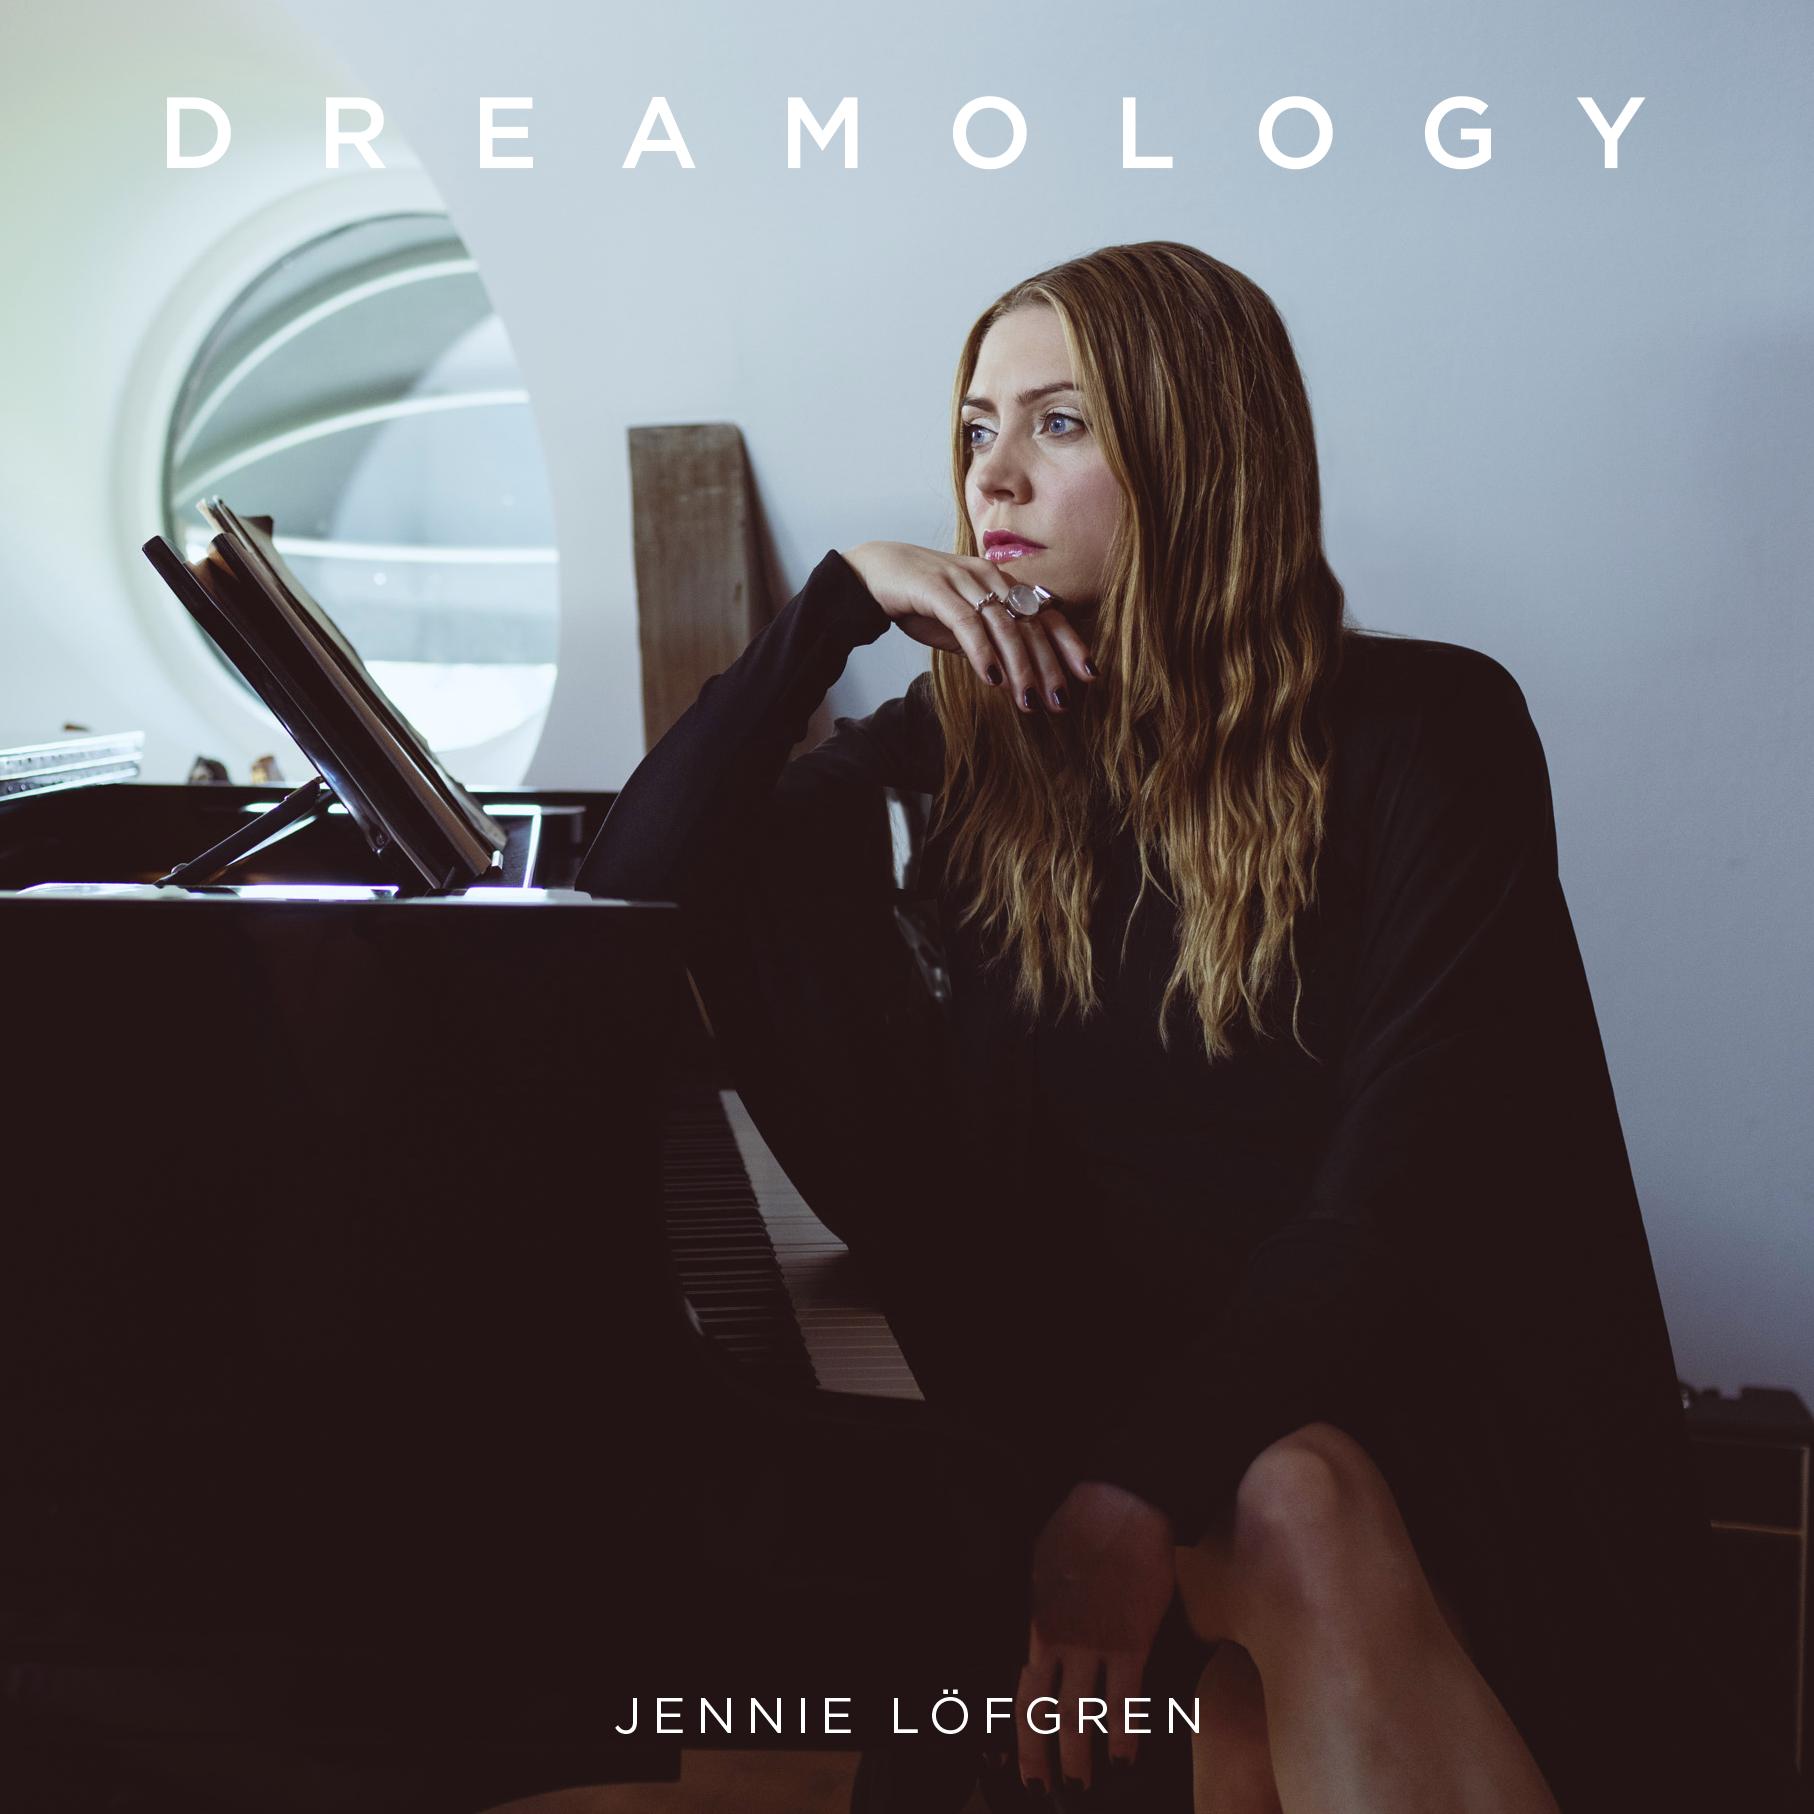 Jennie_Löfgren_Dreamology_Albumomslag.png